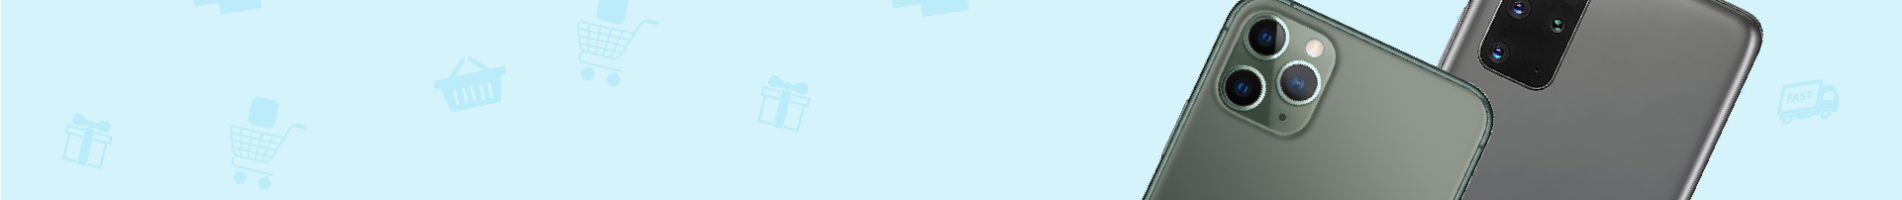 TIT WEB 1920x600-19